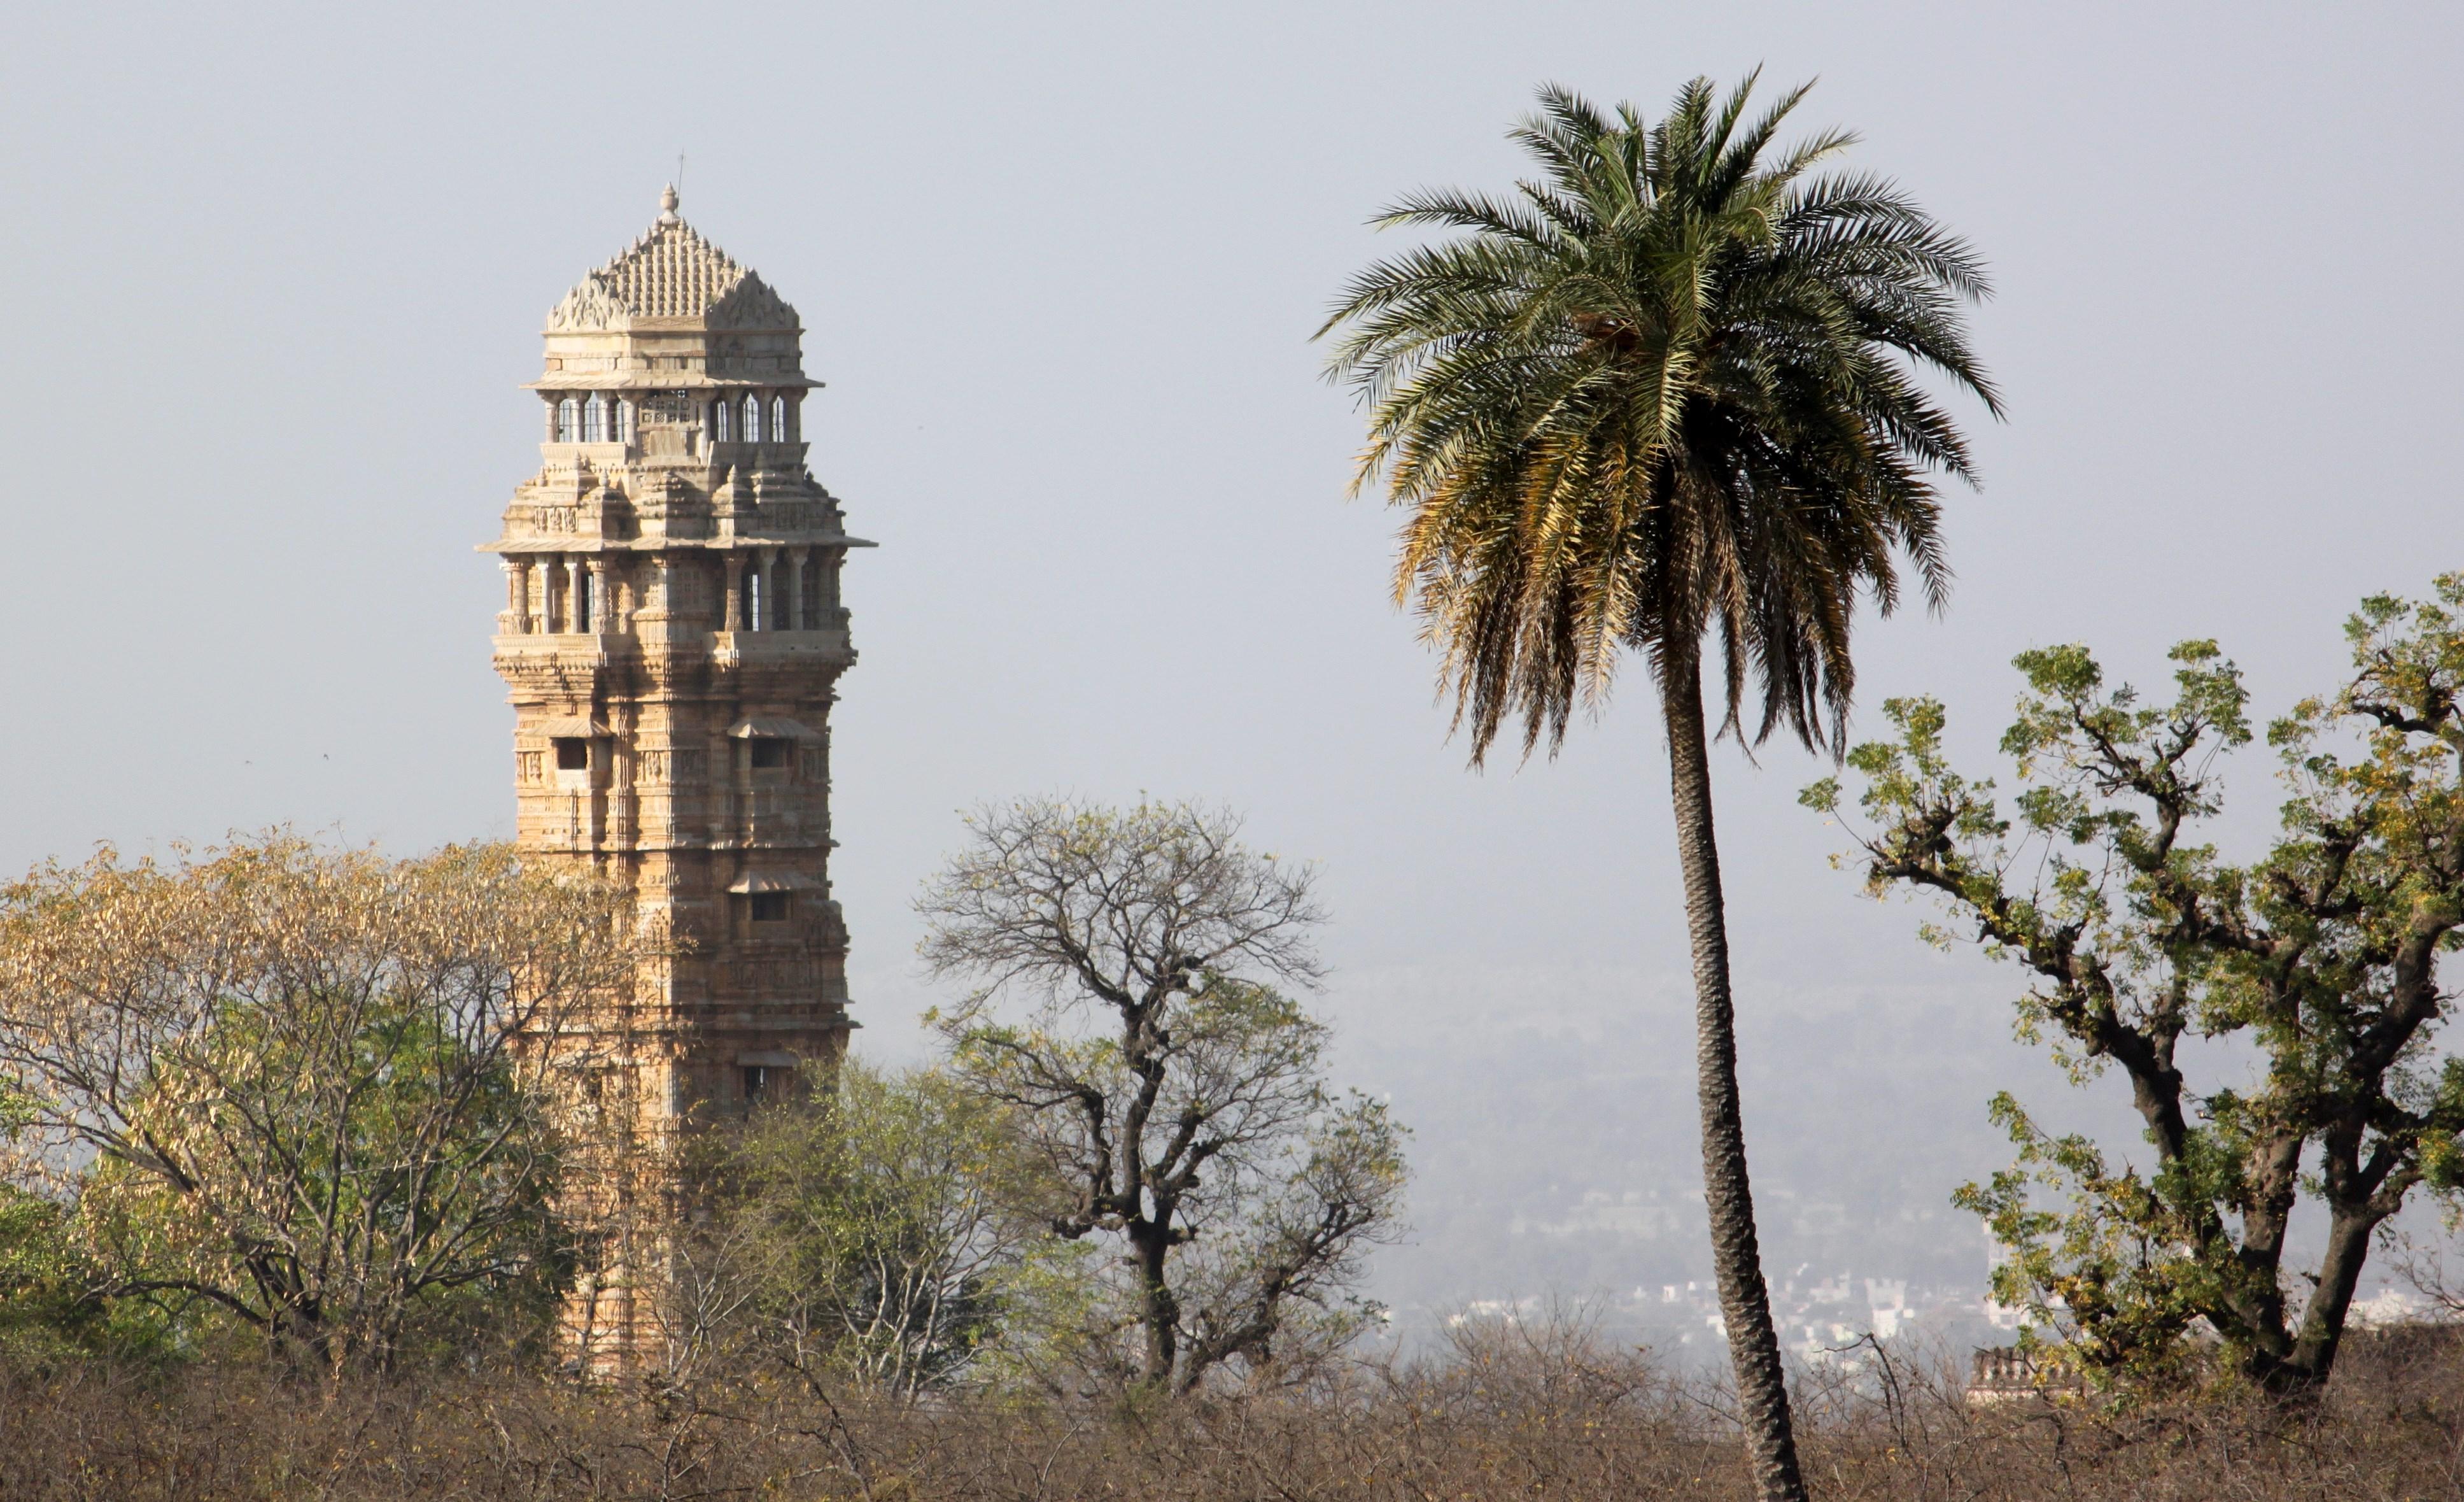 Vijay Stambha (Tower of Victory) 14